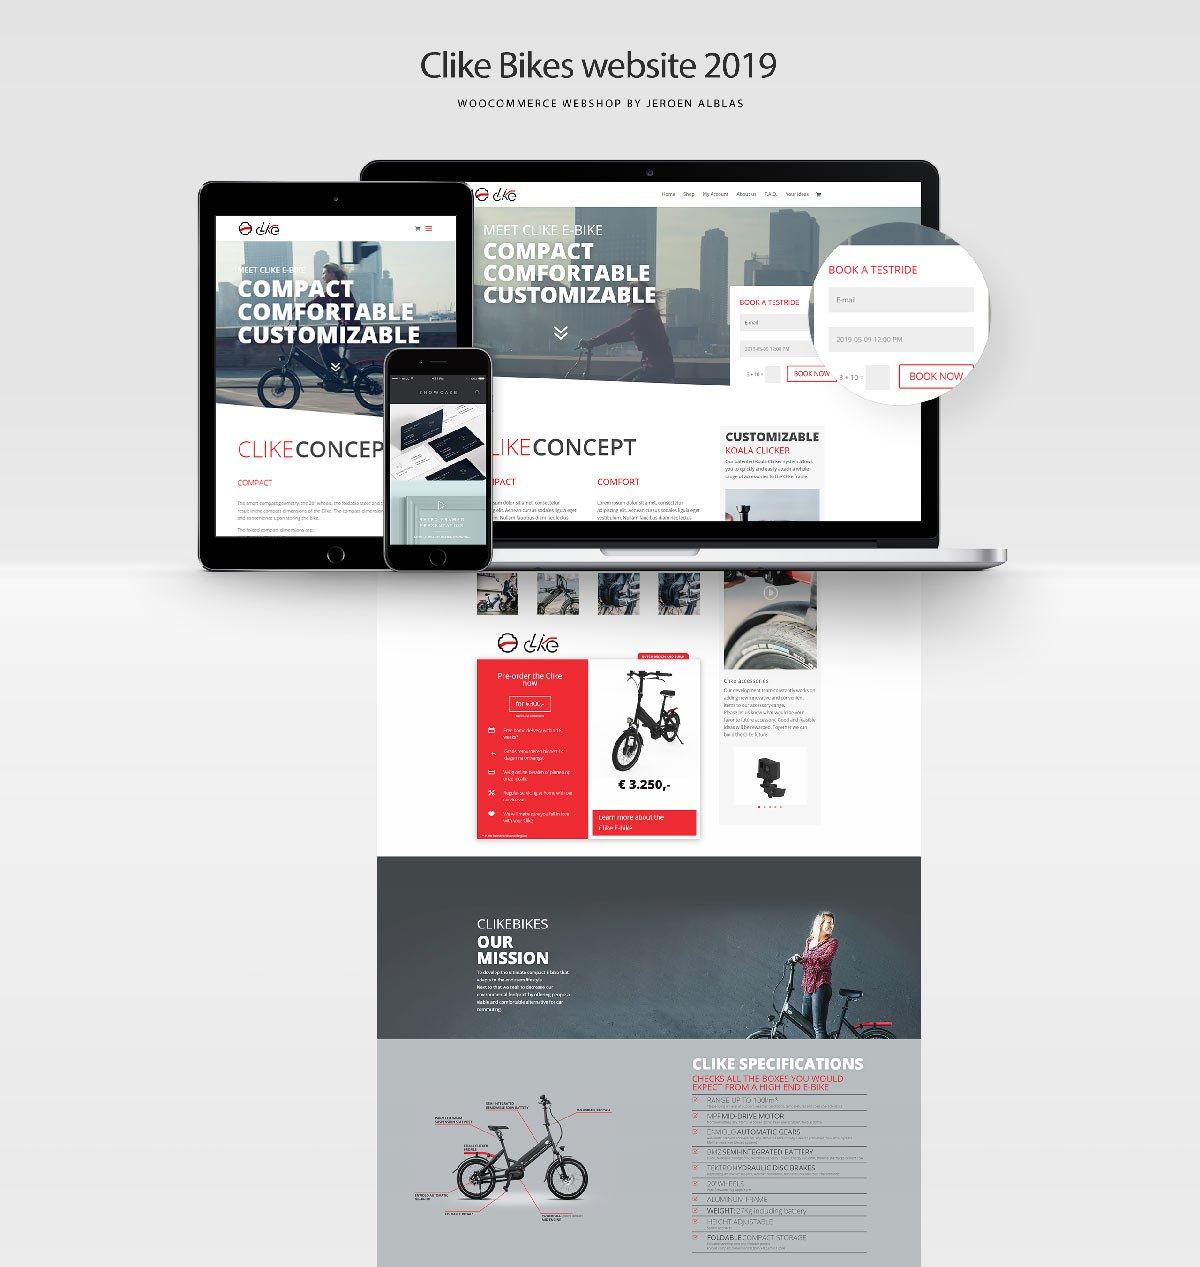 Showcase-Clikebikes-website2019